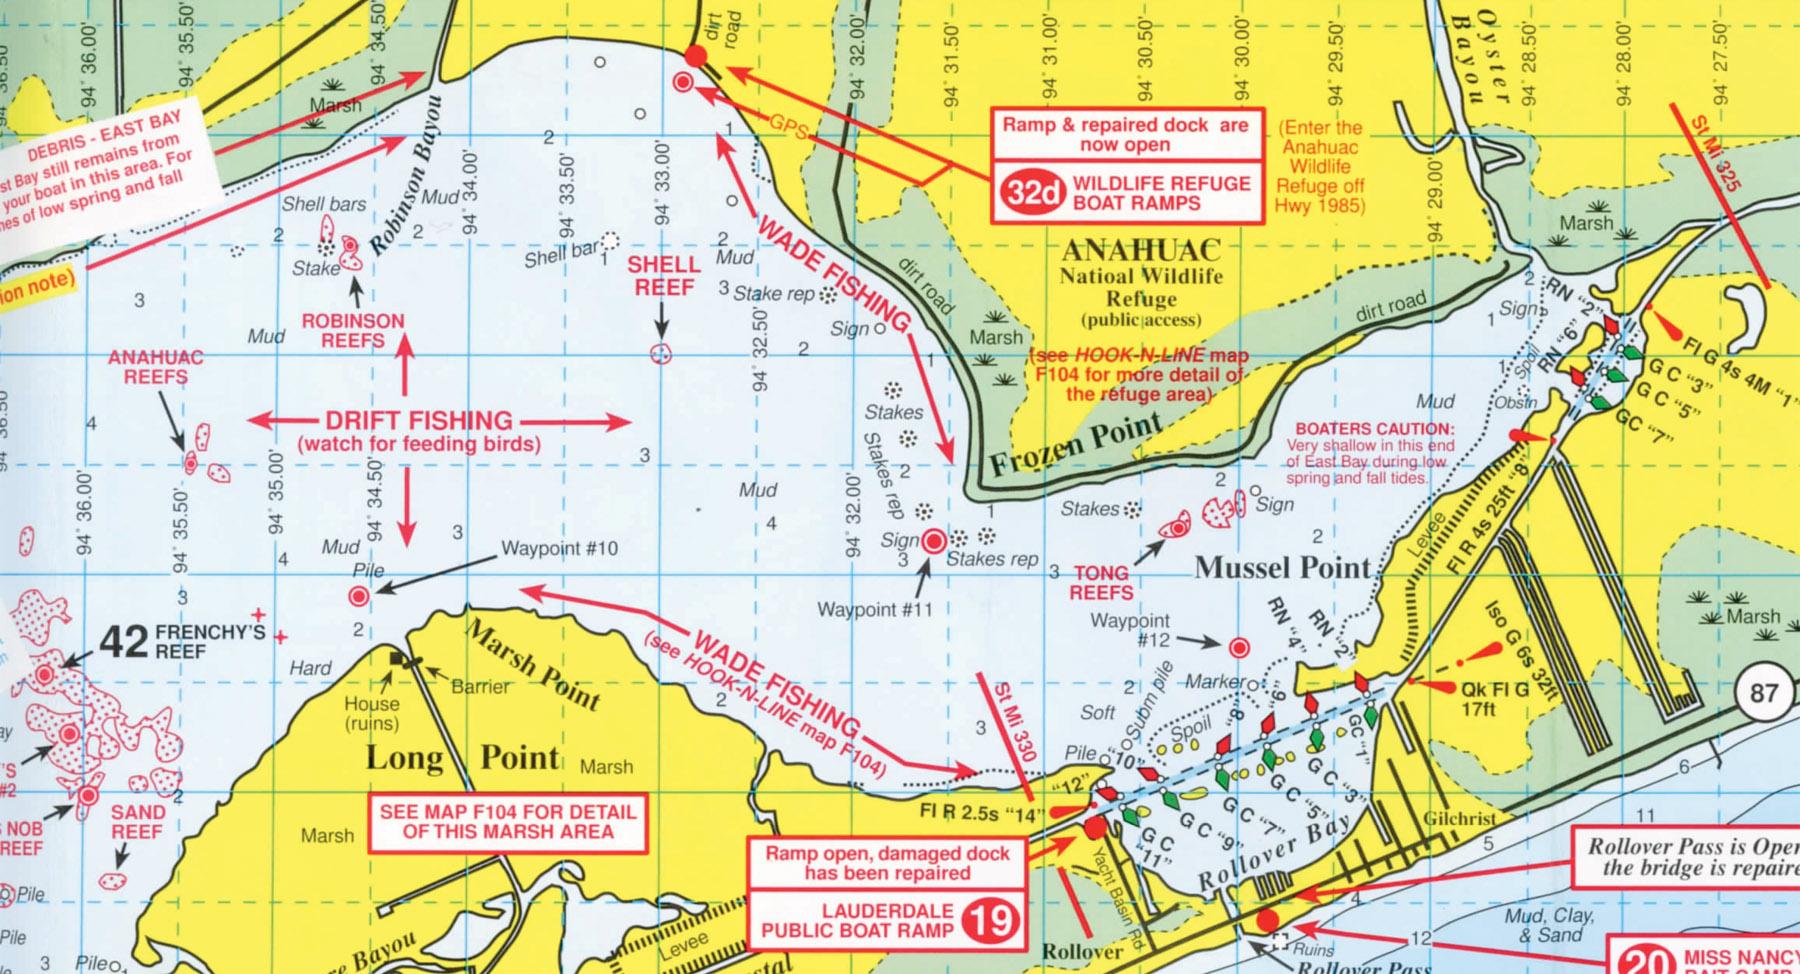 Anahuac National Wildlife Refuge - Texas Wade Fishing Maps